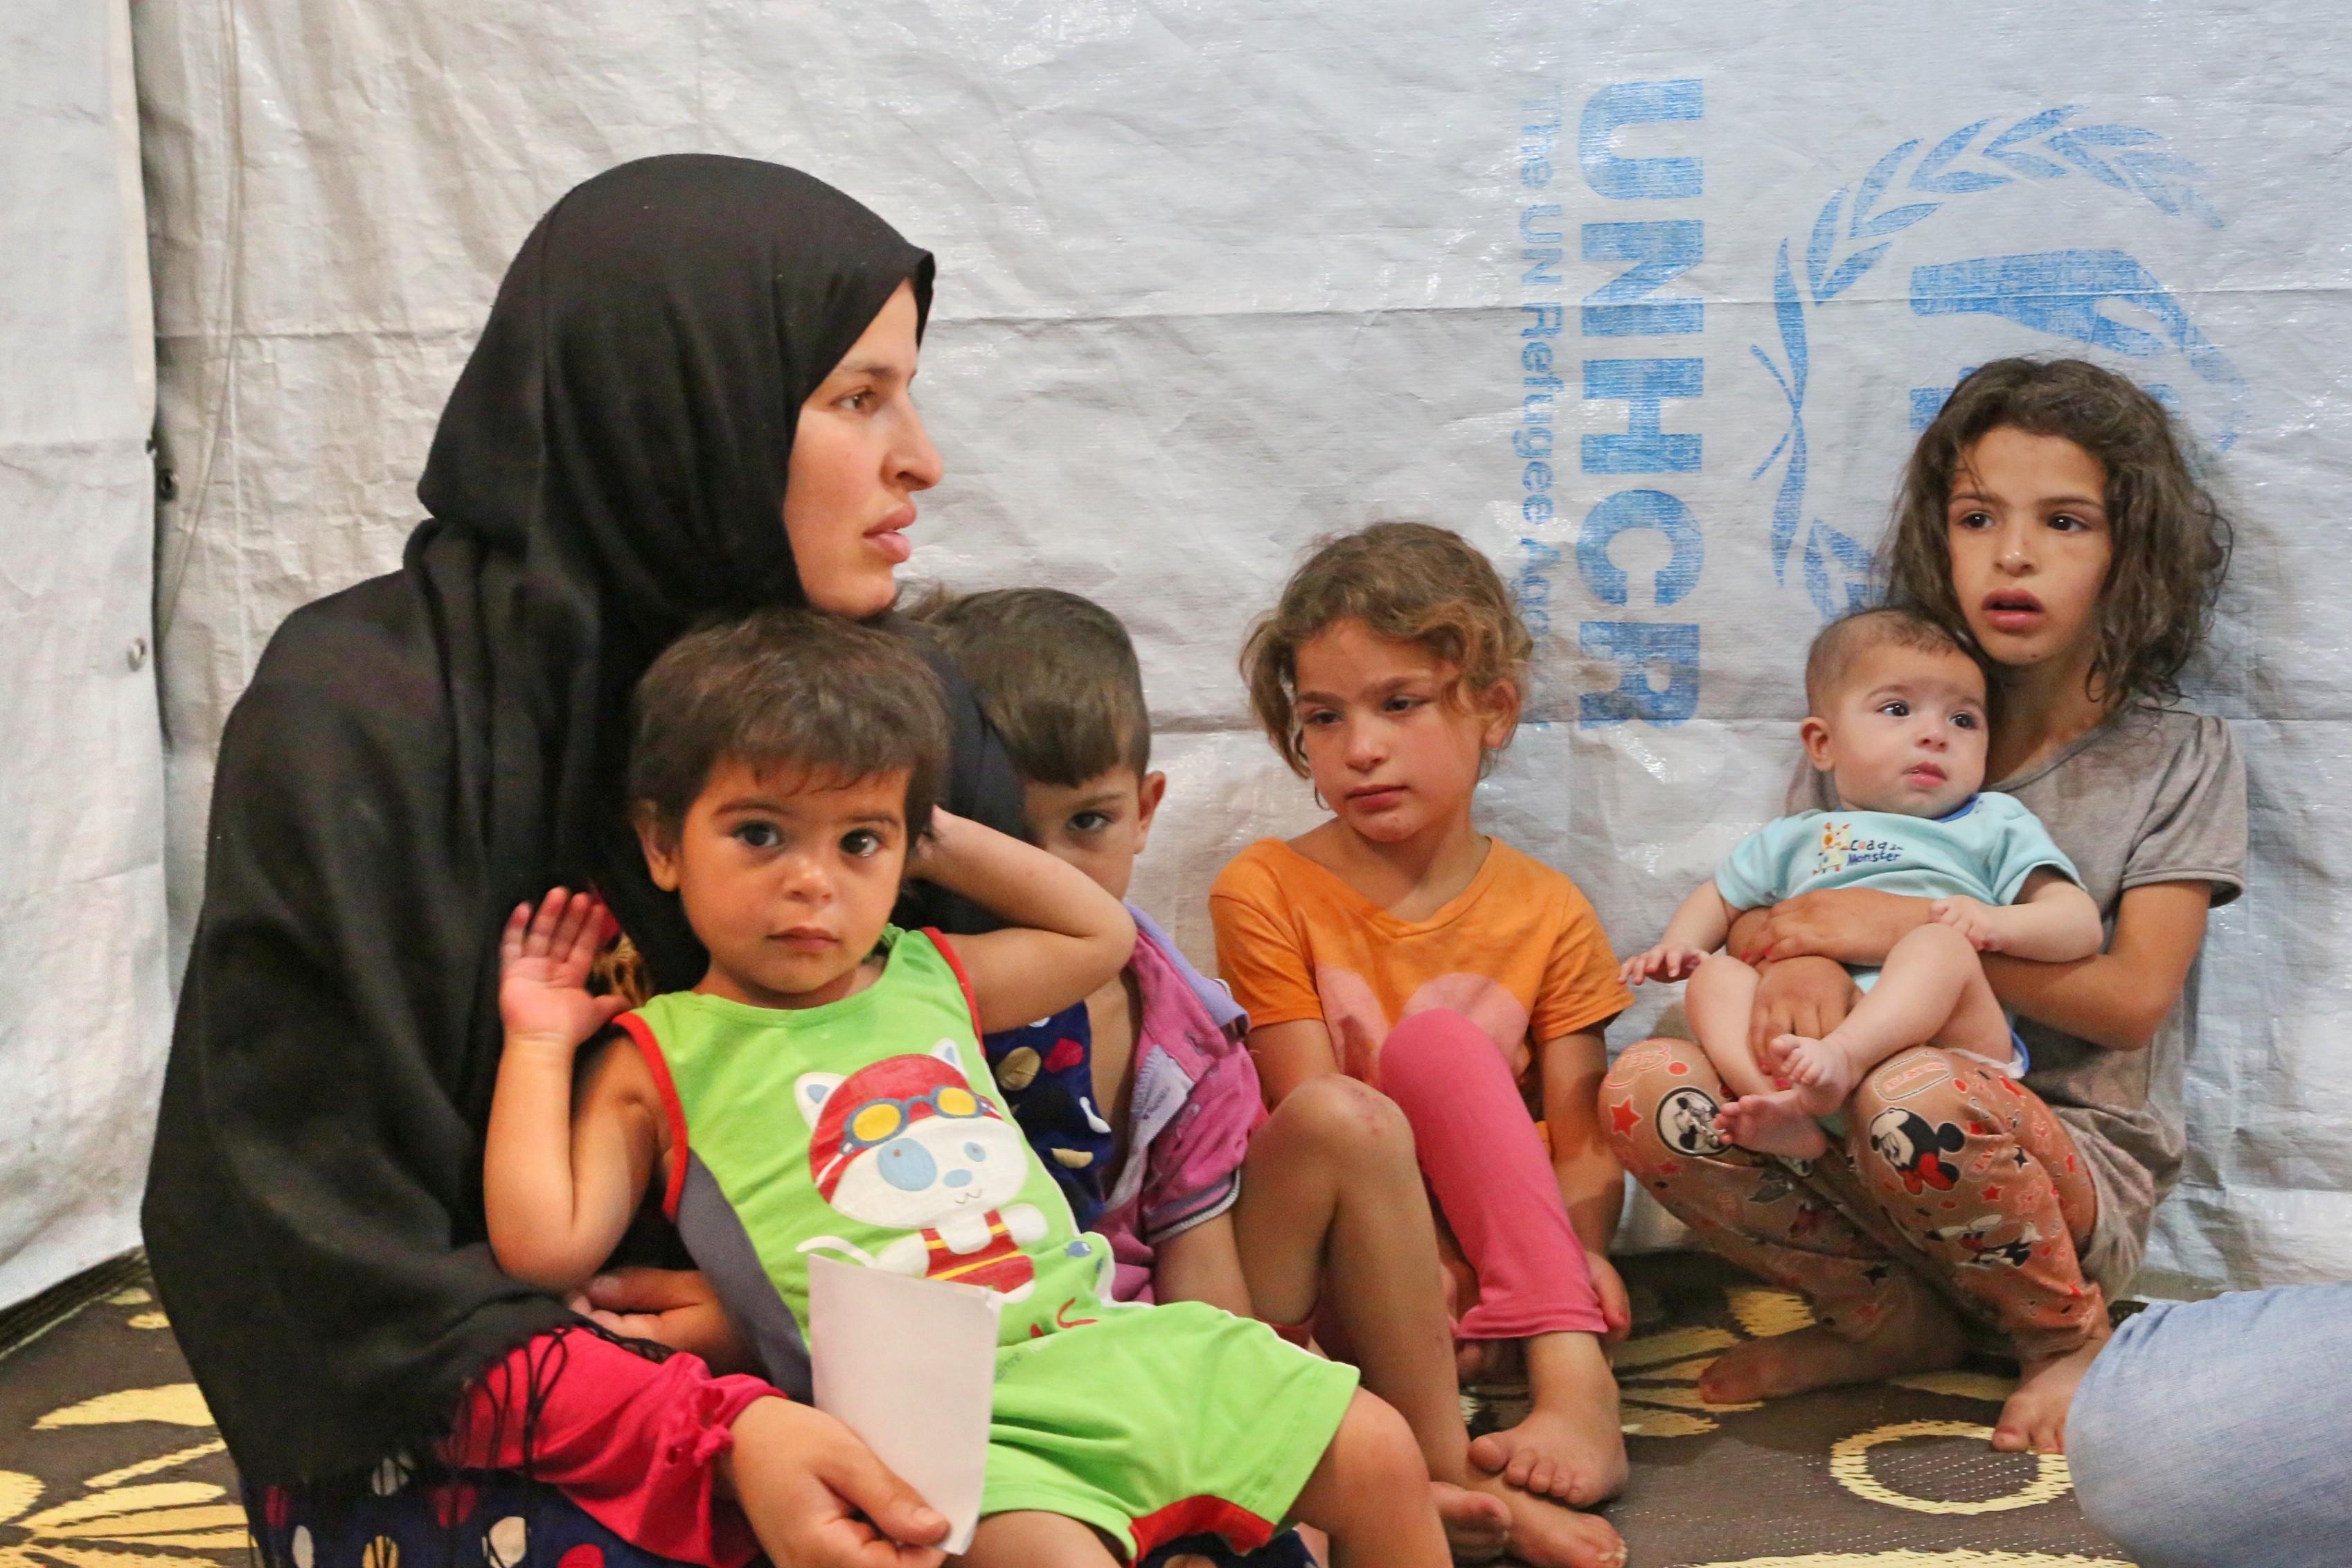 Fatima and five of her children